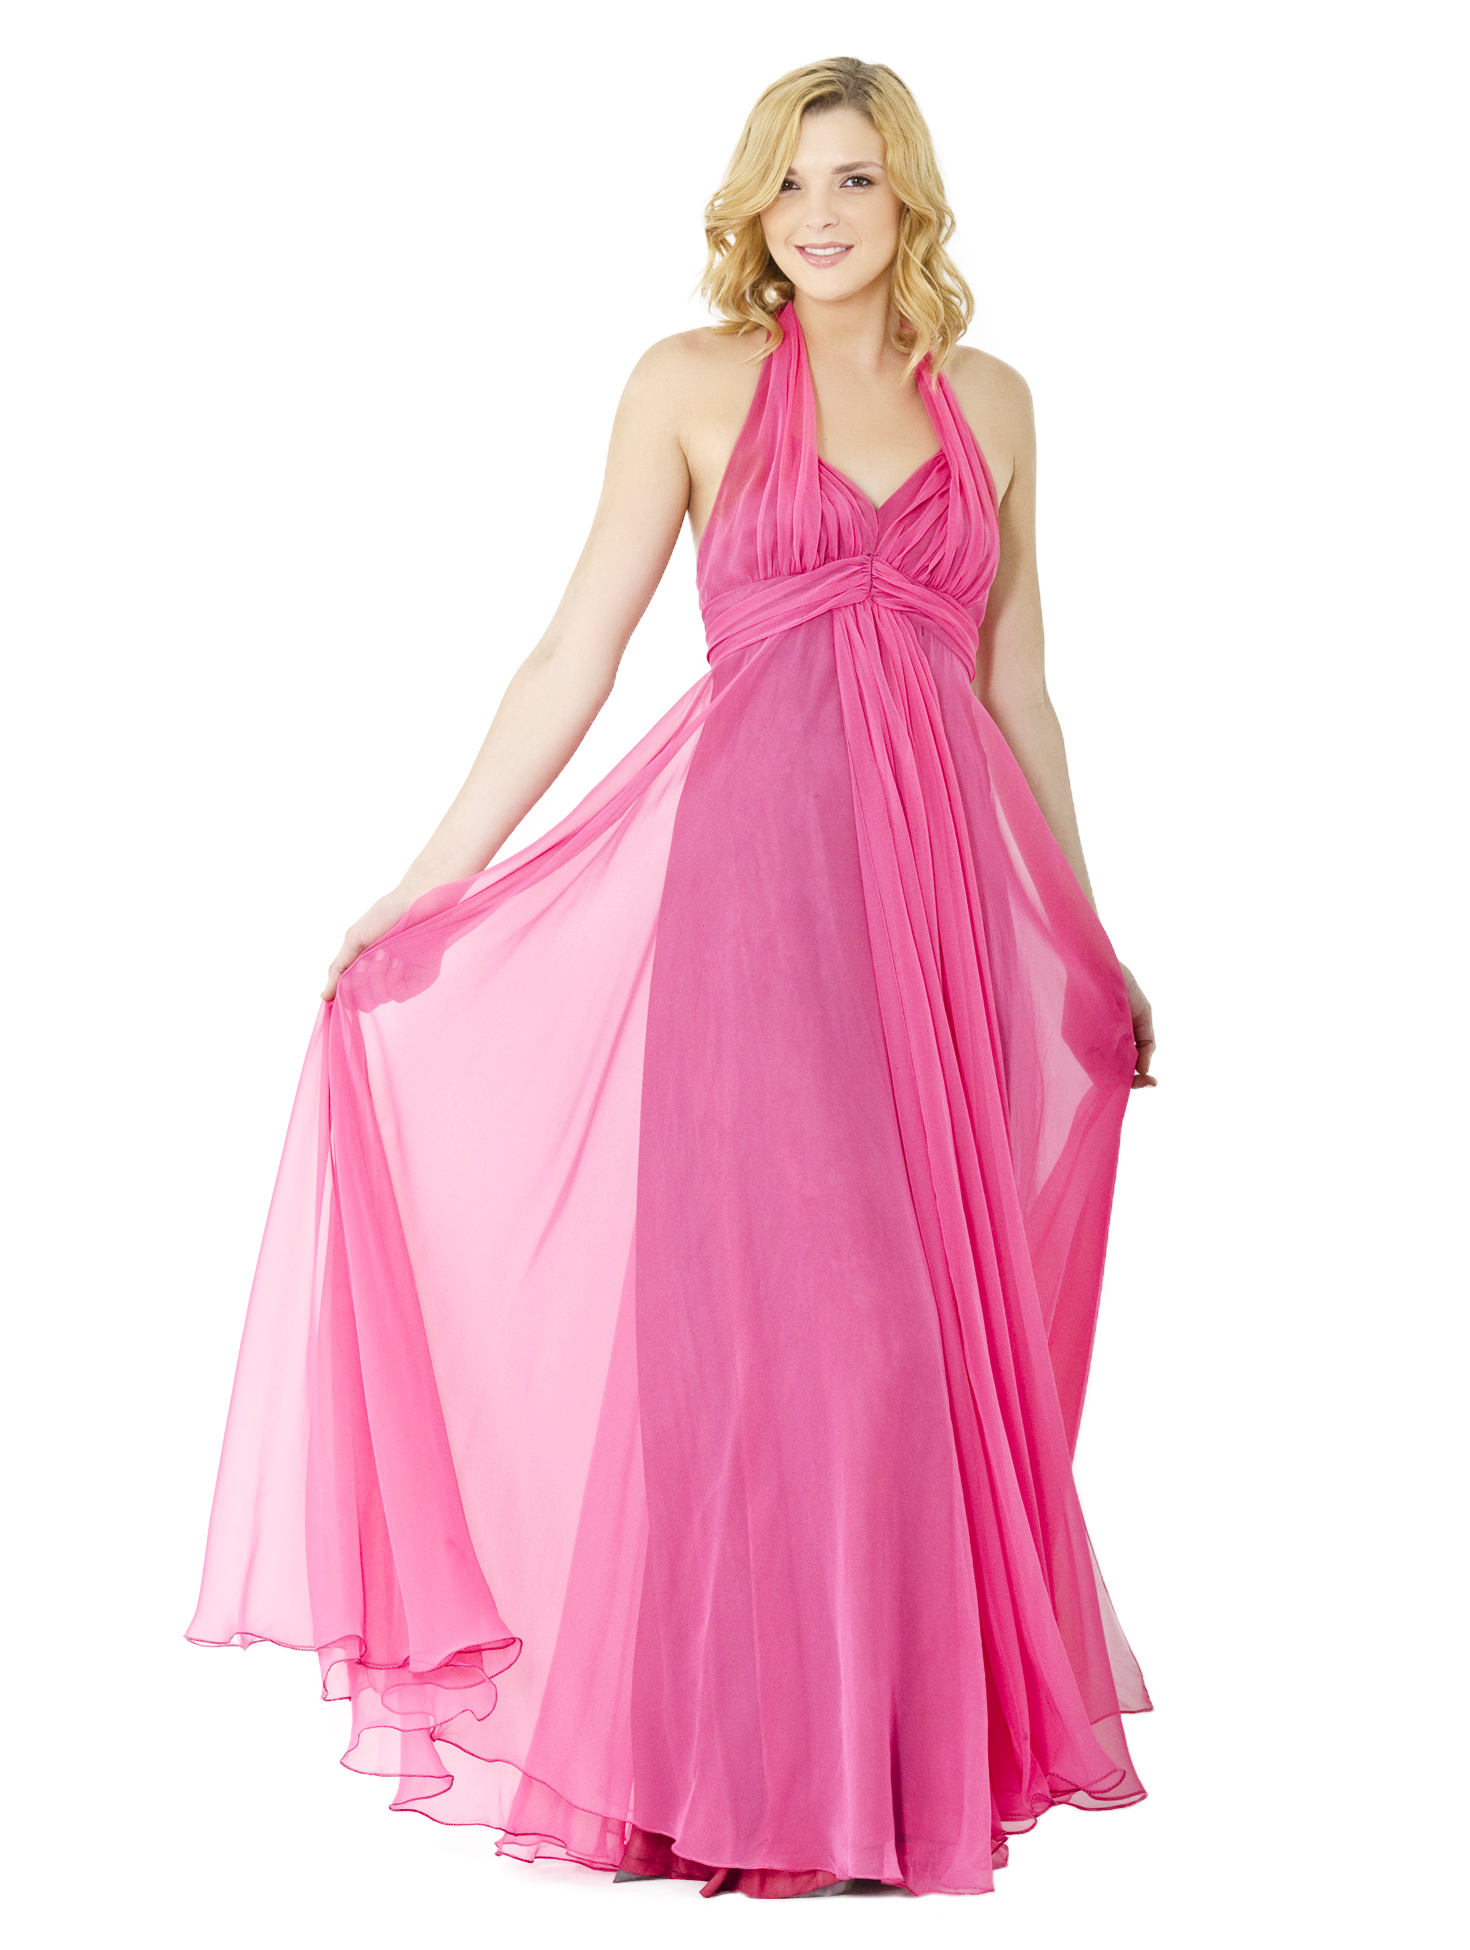 Vintage Halston 1970\'s Pink Halter Gown - Size USA 4 | AmandaMills